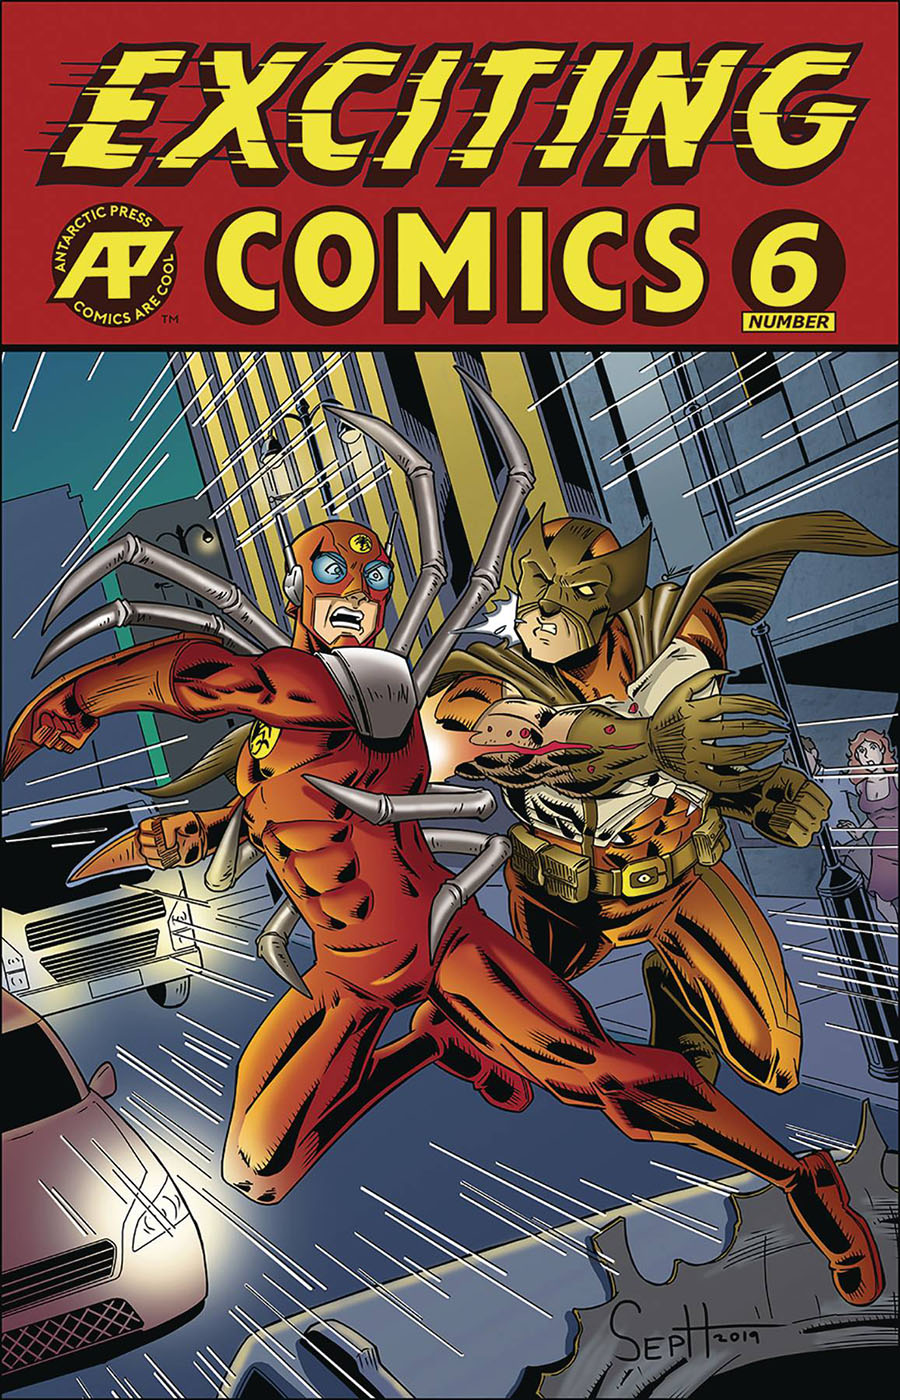 Exciting Comics Vol 2 #6 Cover A Regular Joseph Olesco Cover